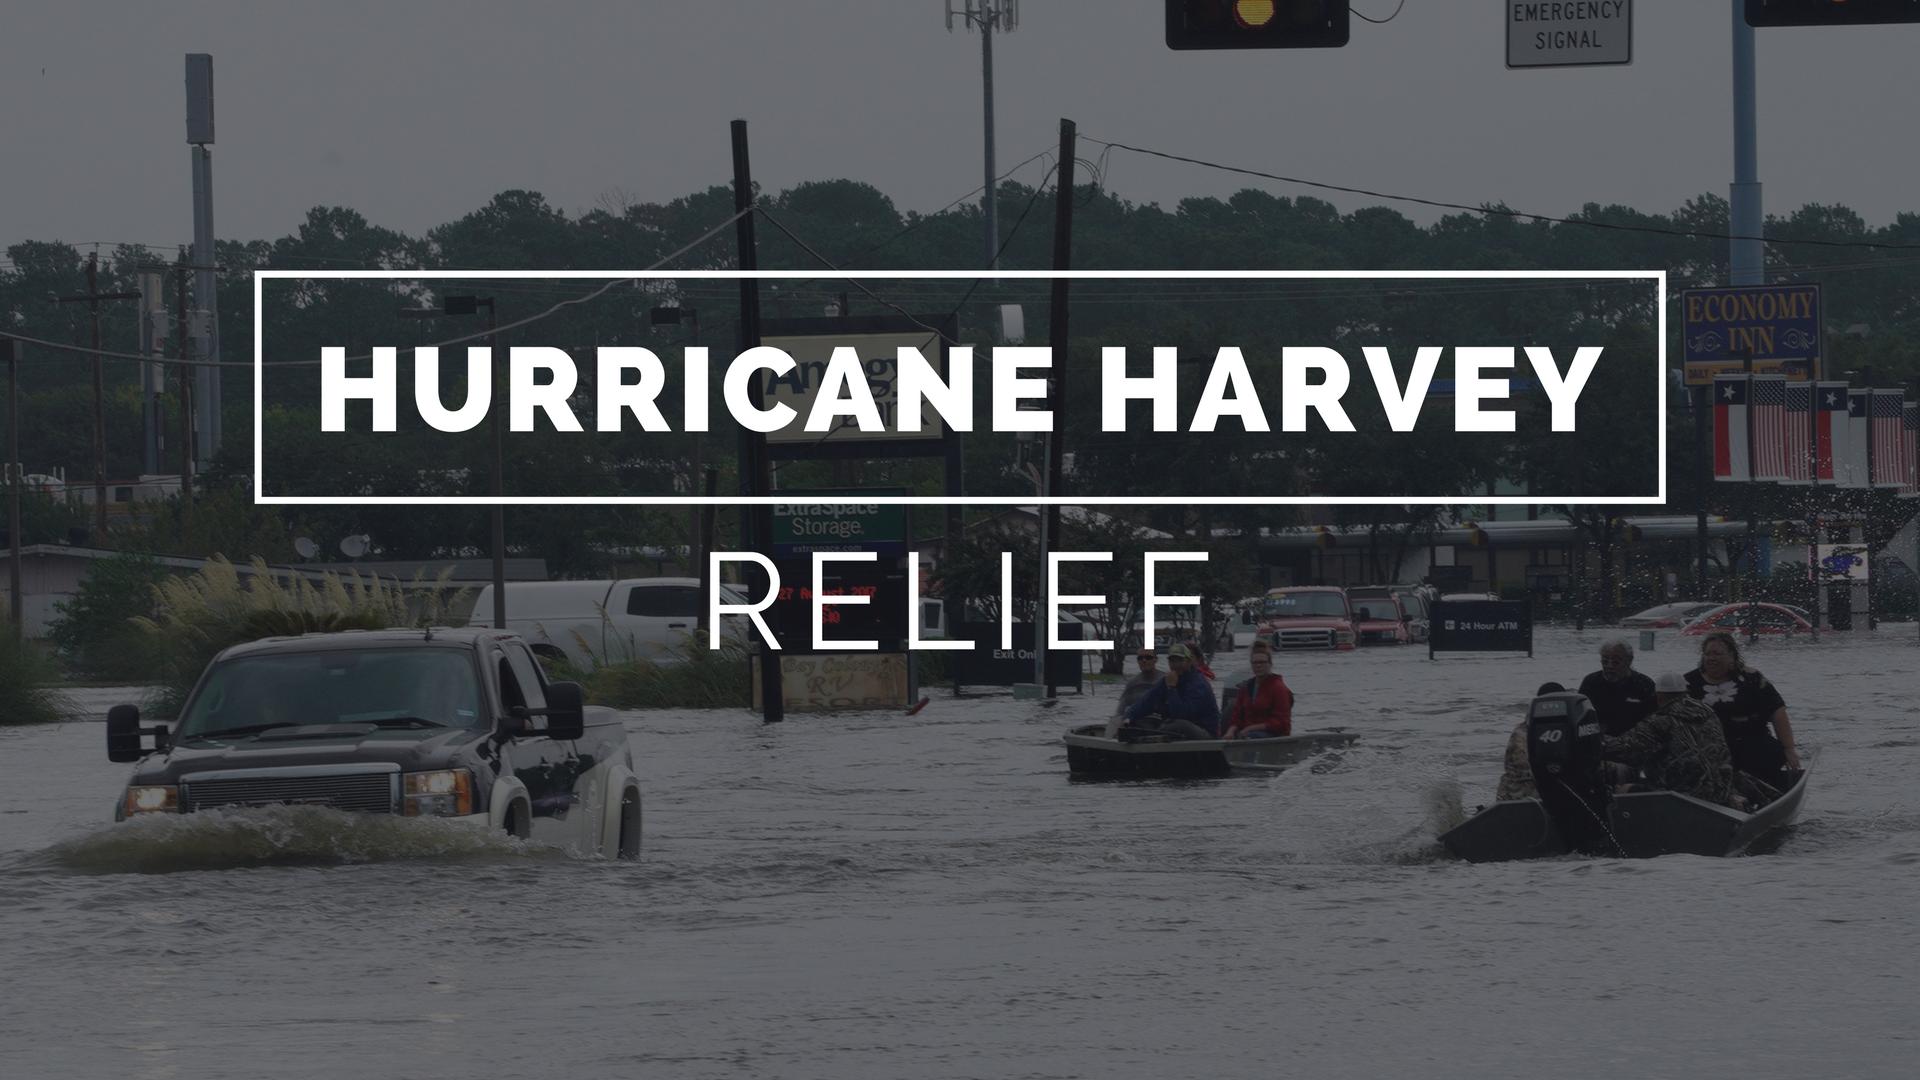 Hurricane harvey relief background